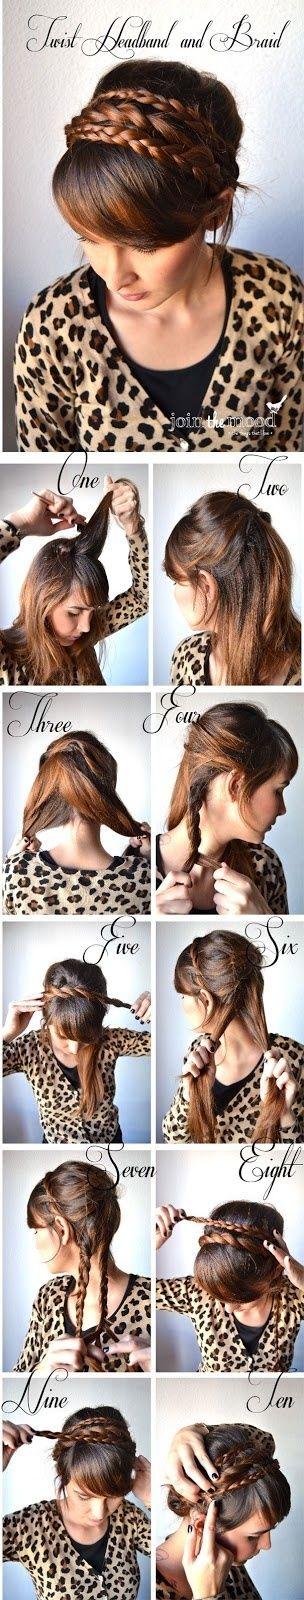 Diadema de trenzas retorcidas - Twist headband and braid